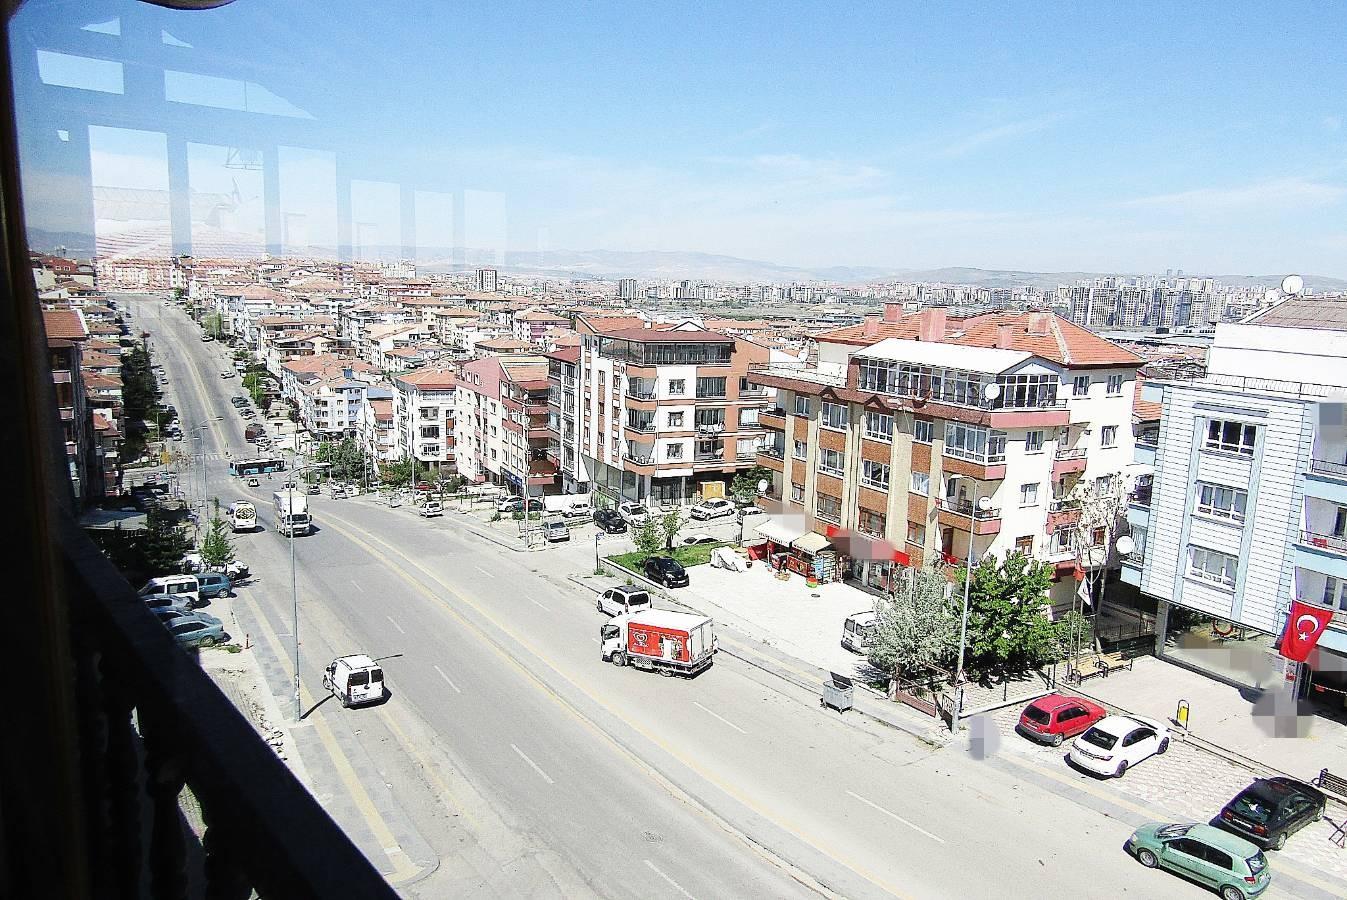 SR EMLAK'TAN PİYADE MAH'DE 5+1 250m² KAPALI TERASLI DAİRE